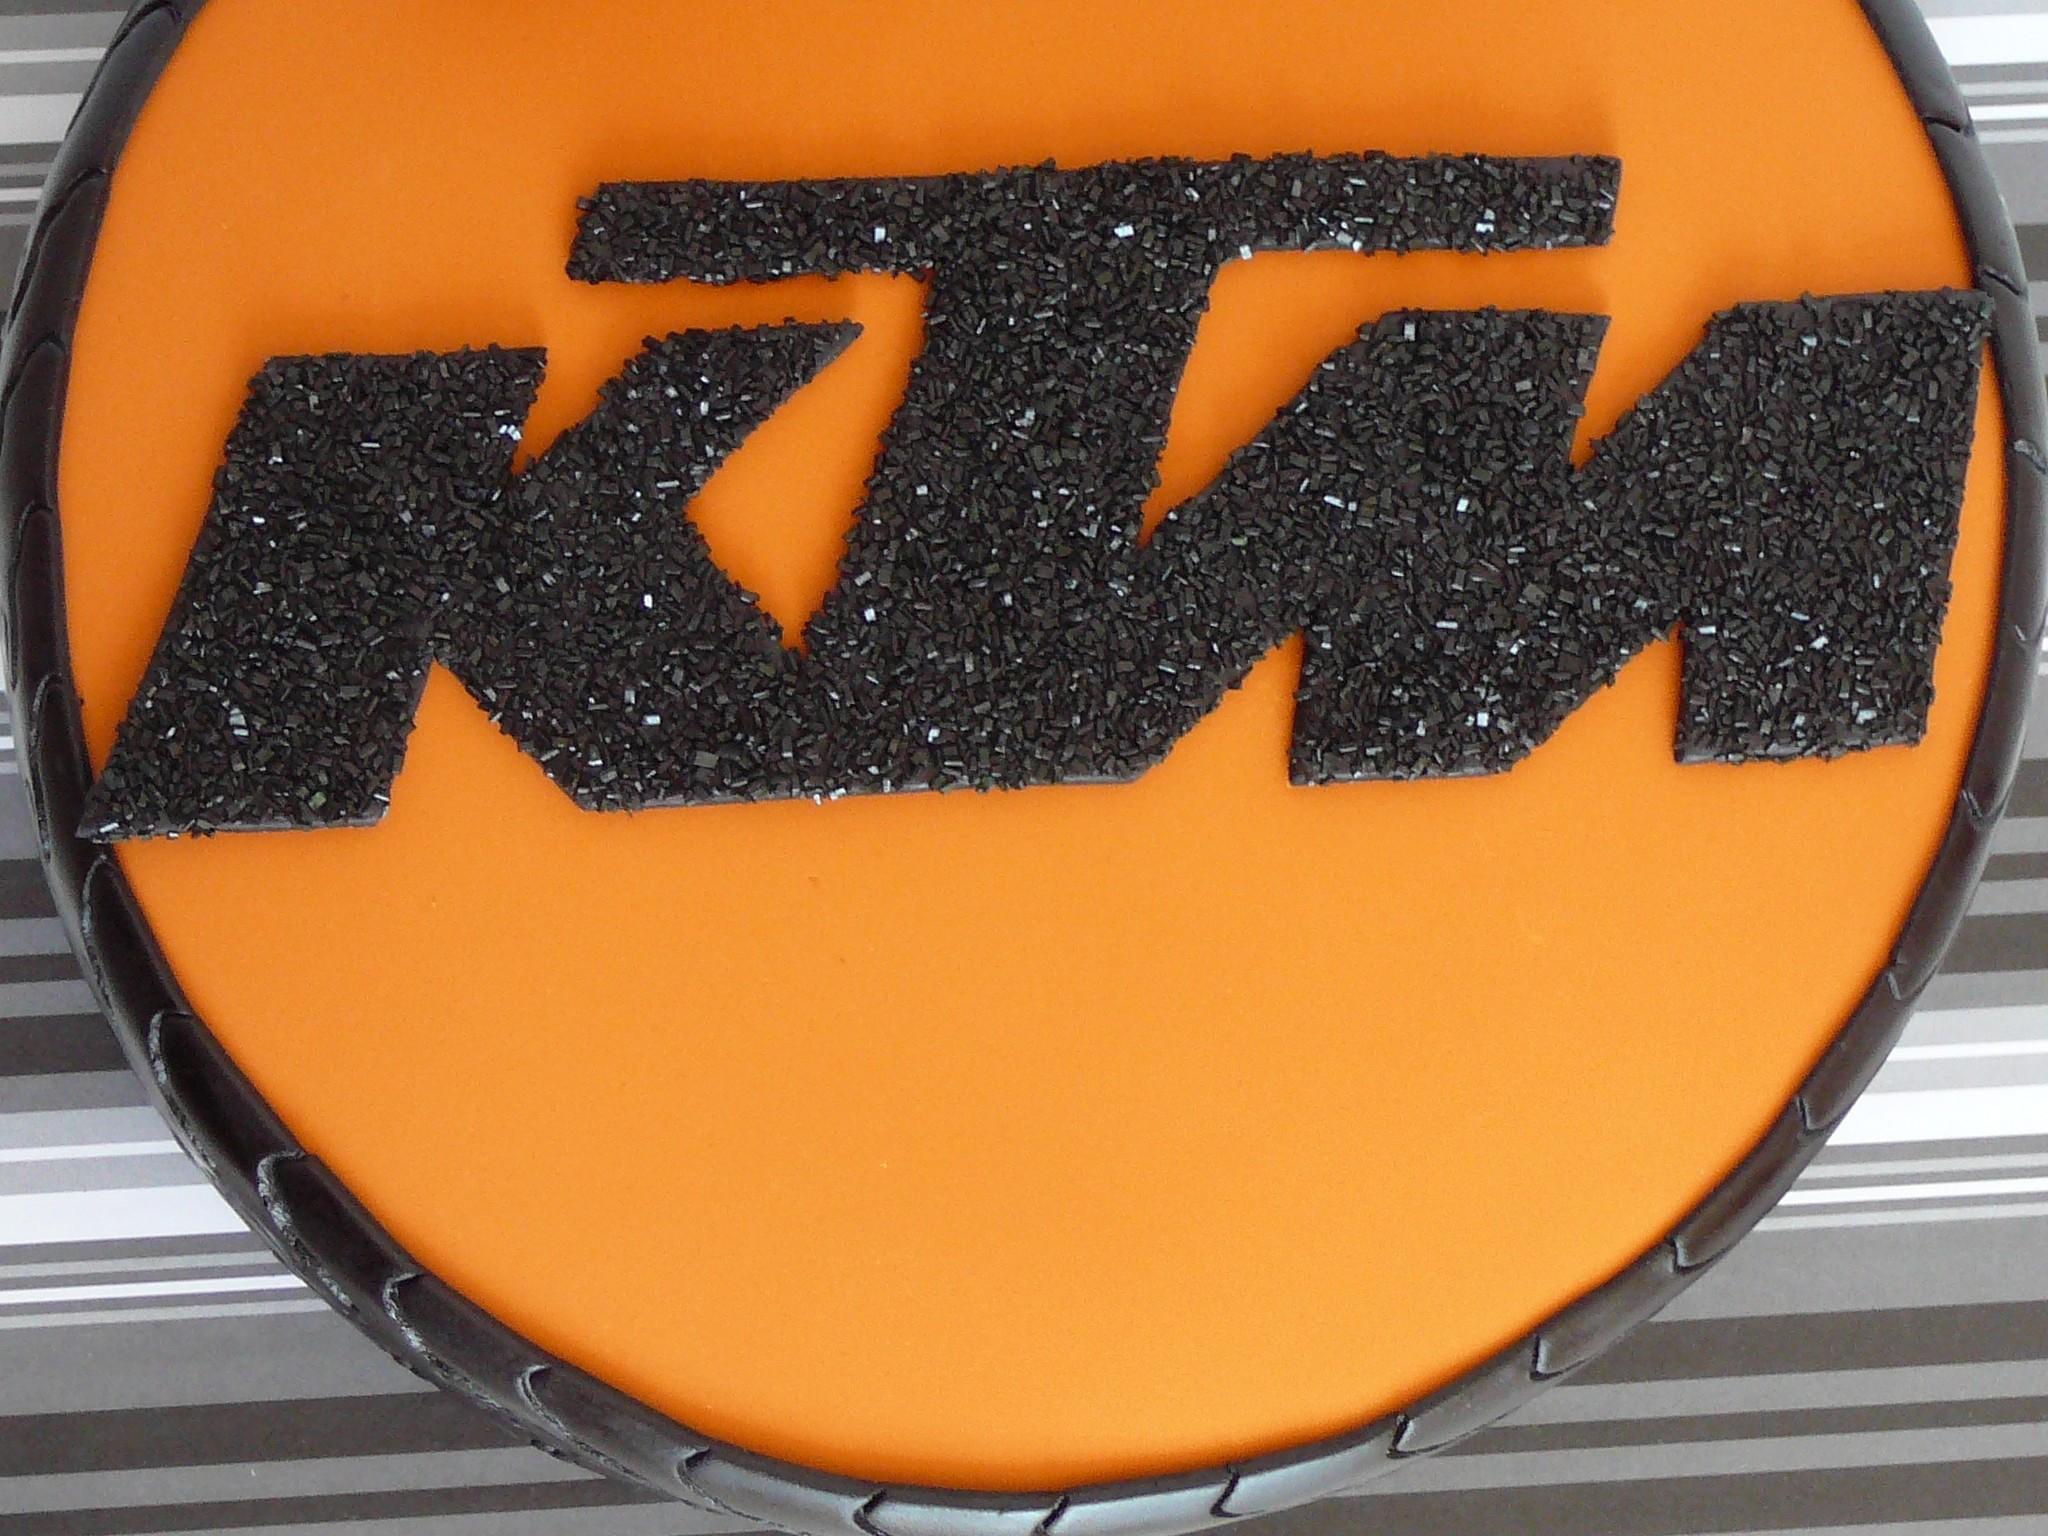 Ktm Motocross Wallpaper Hd Ktm Logo Wallpaper 72 Images